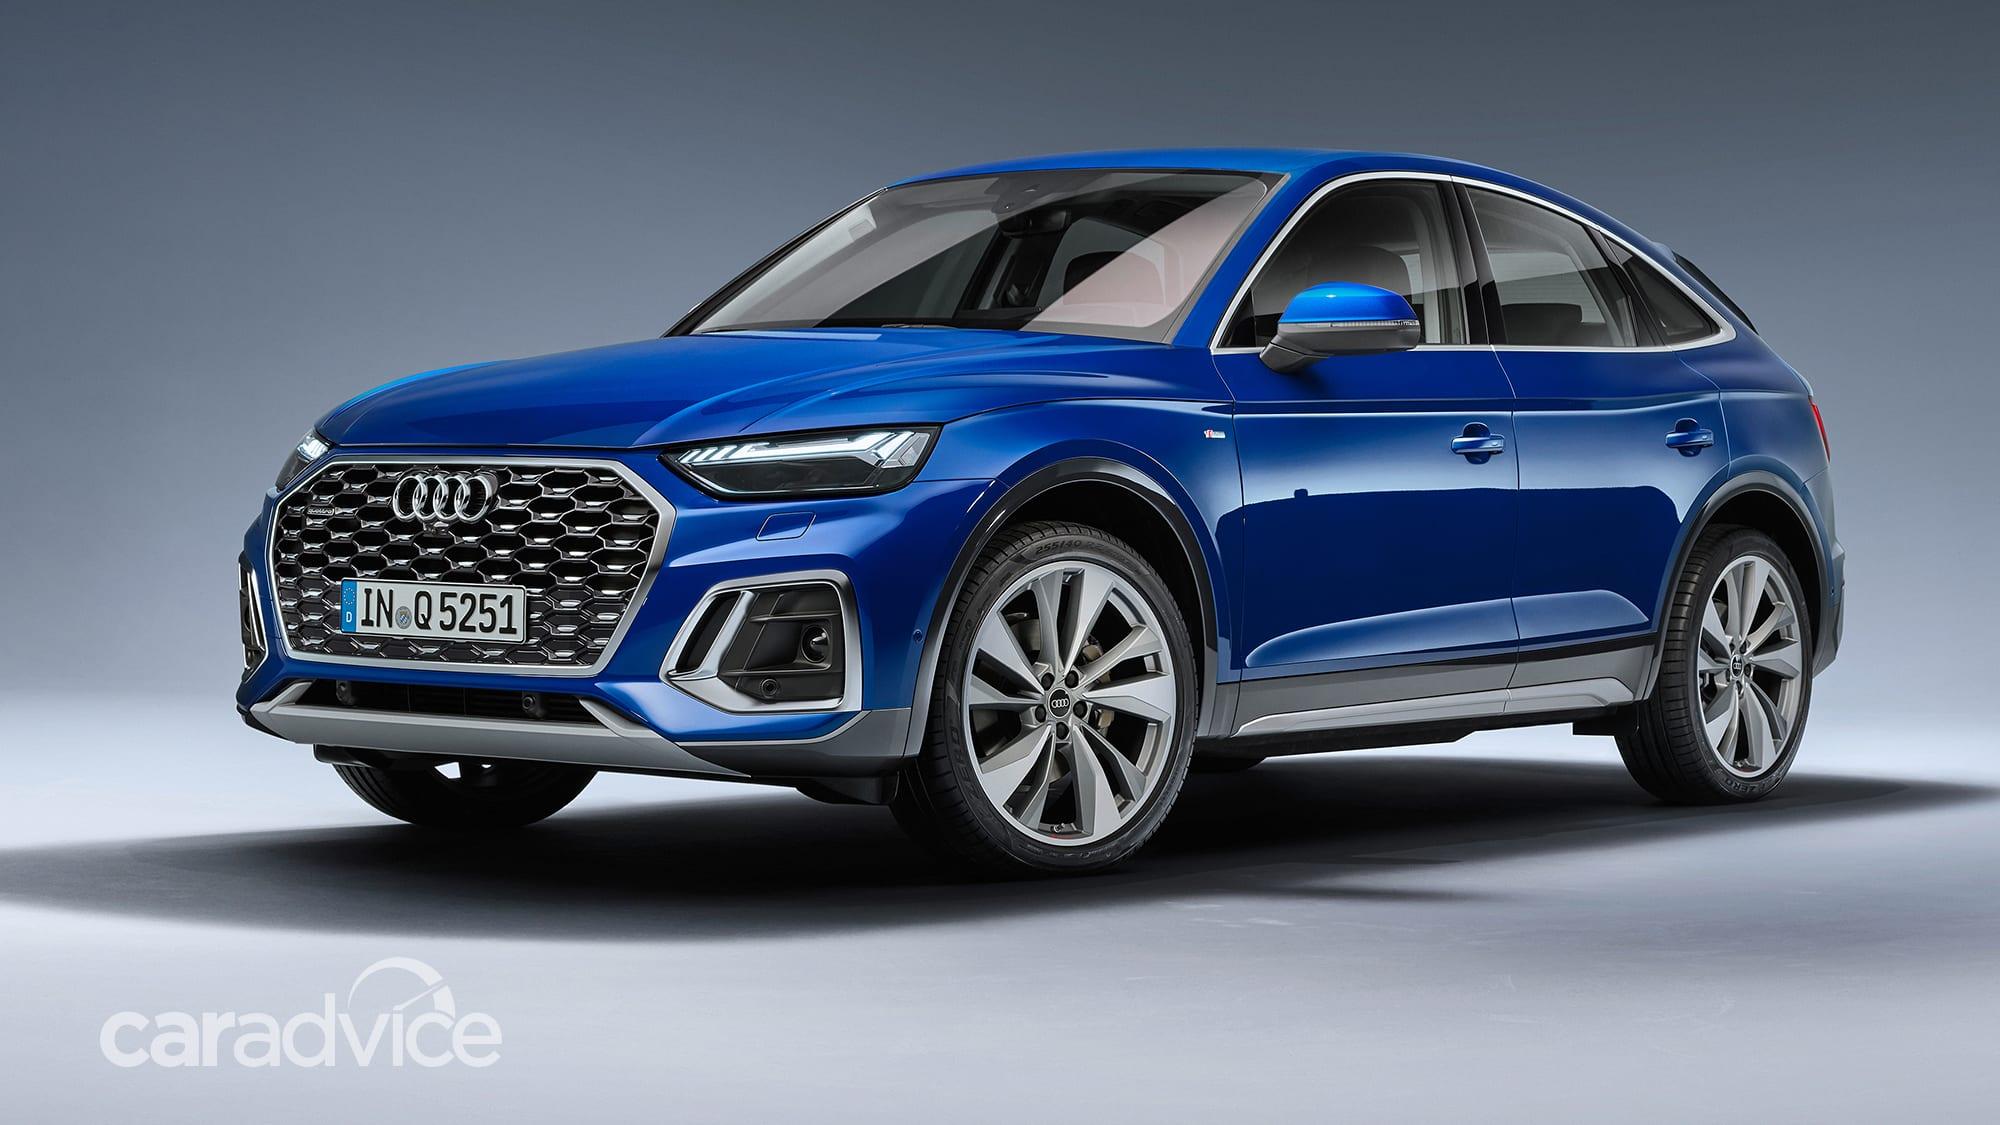 2021 Audi Q5 Sportback revealed | CarAdvice